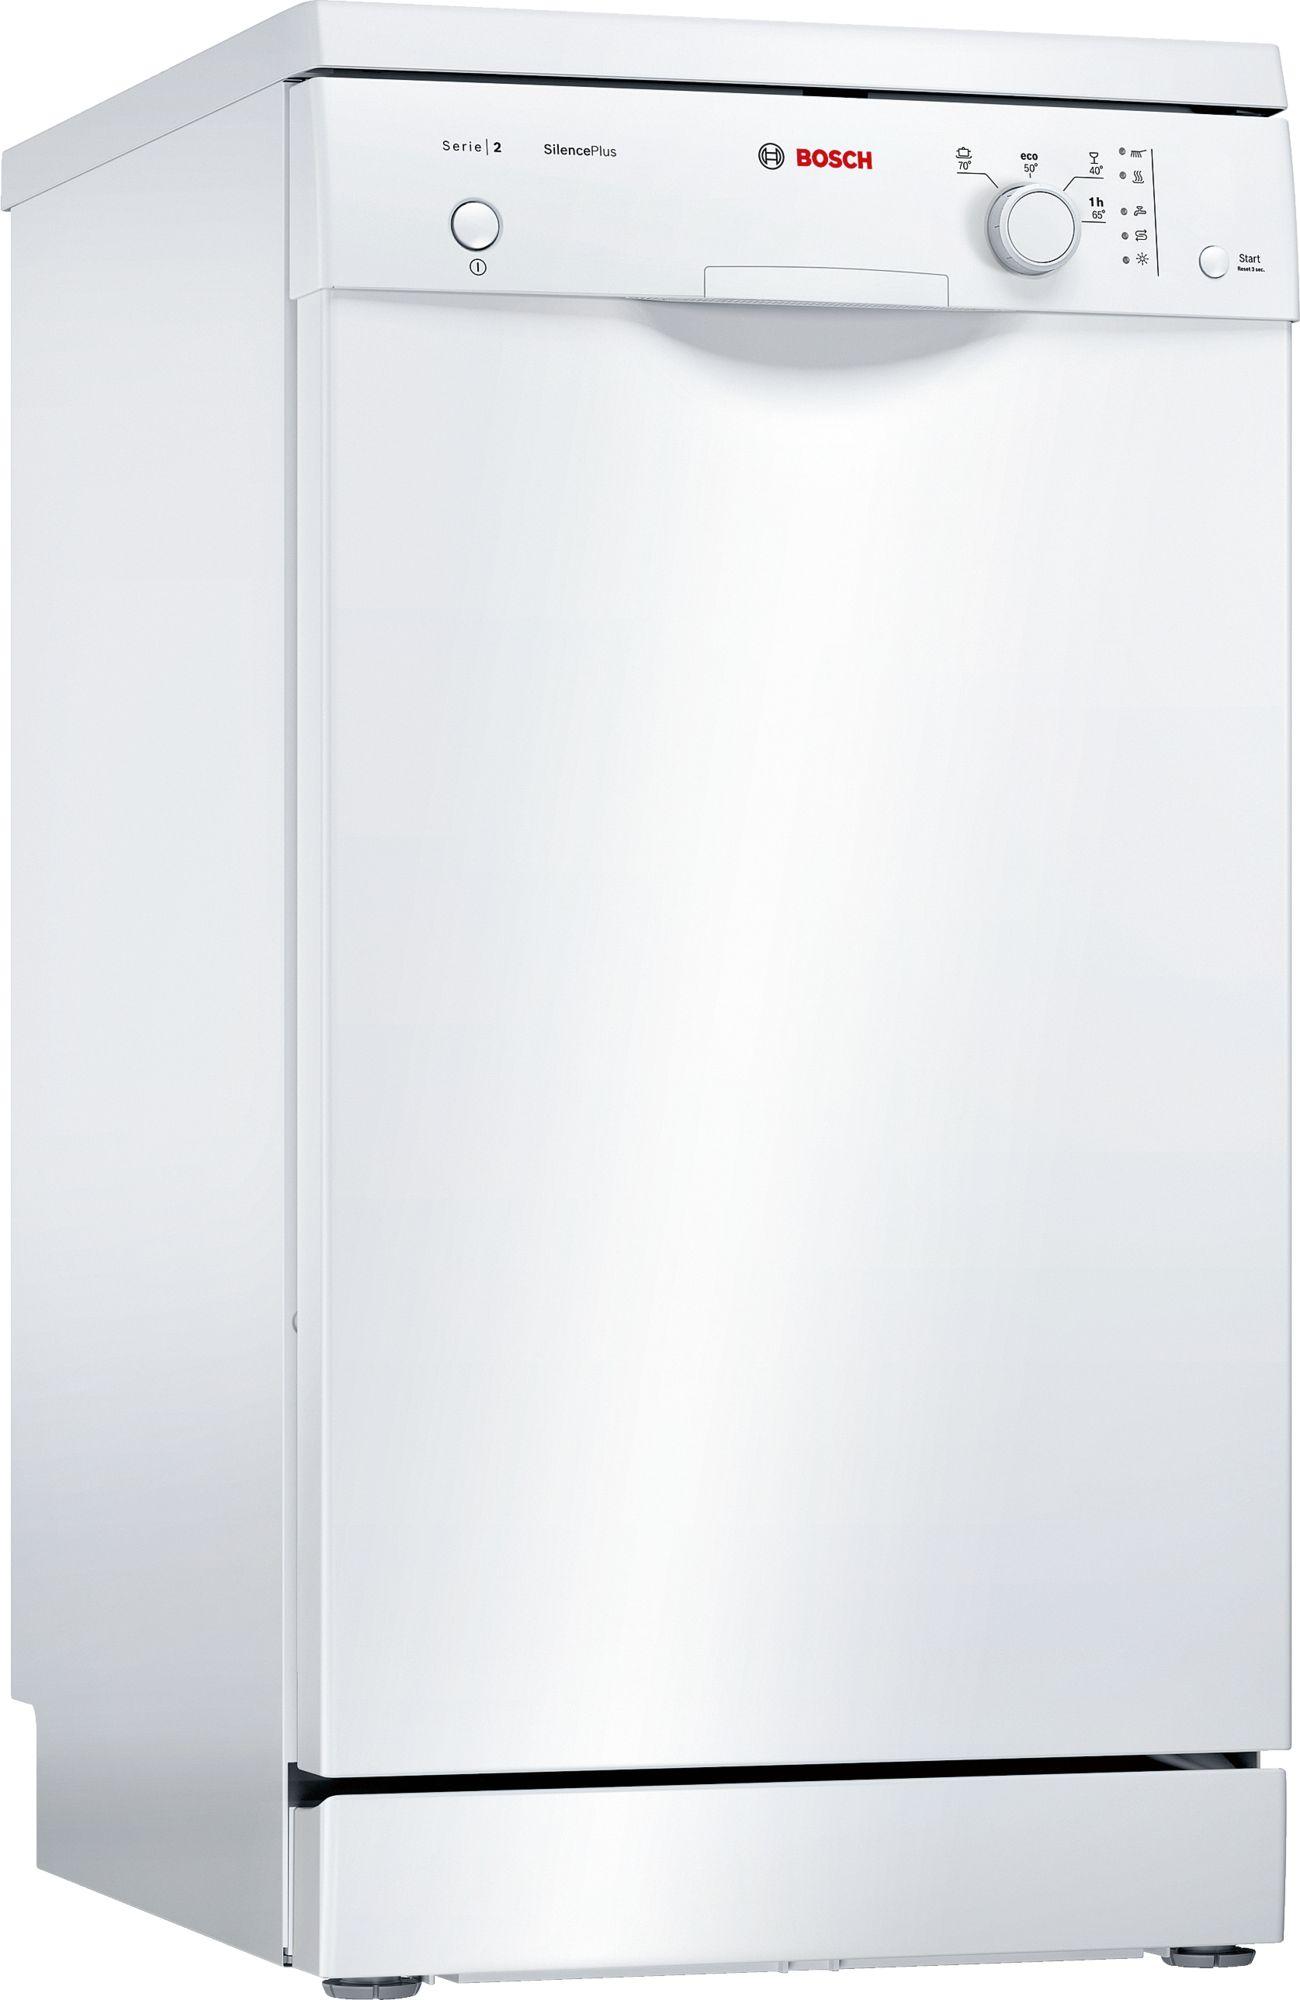 Serie | 2 Silence Plus mašina za pranje sudova, 45 cm samostalna mašina za pranje sudova, bela